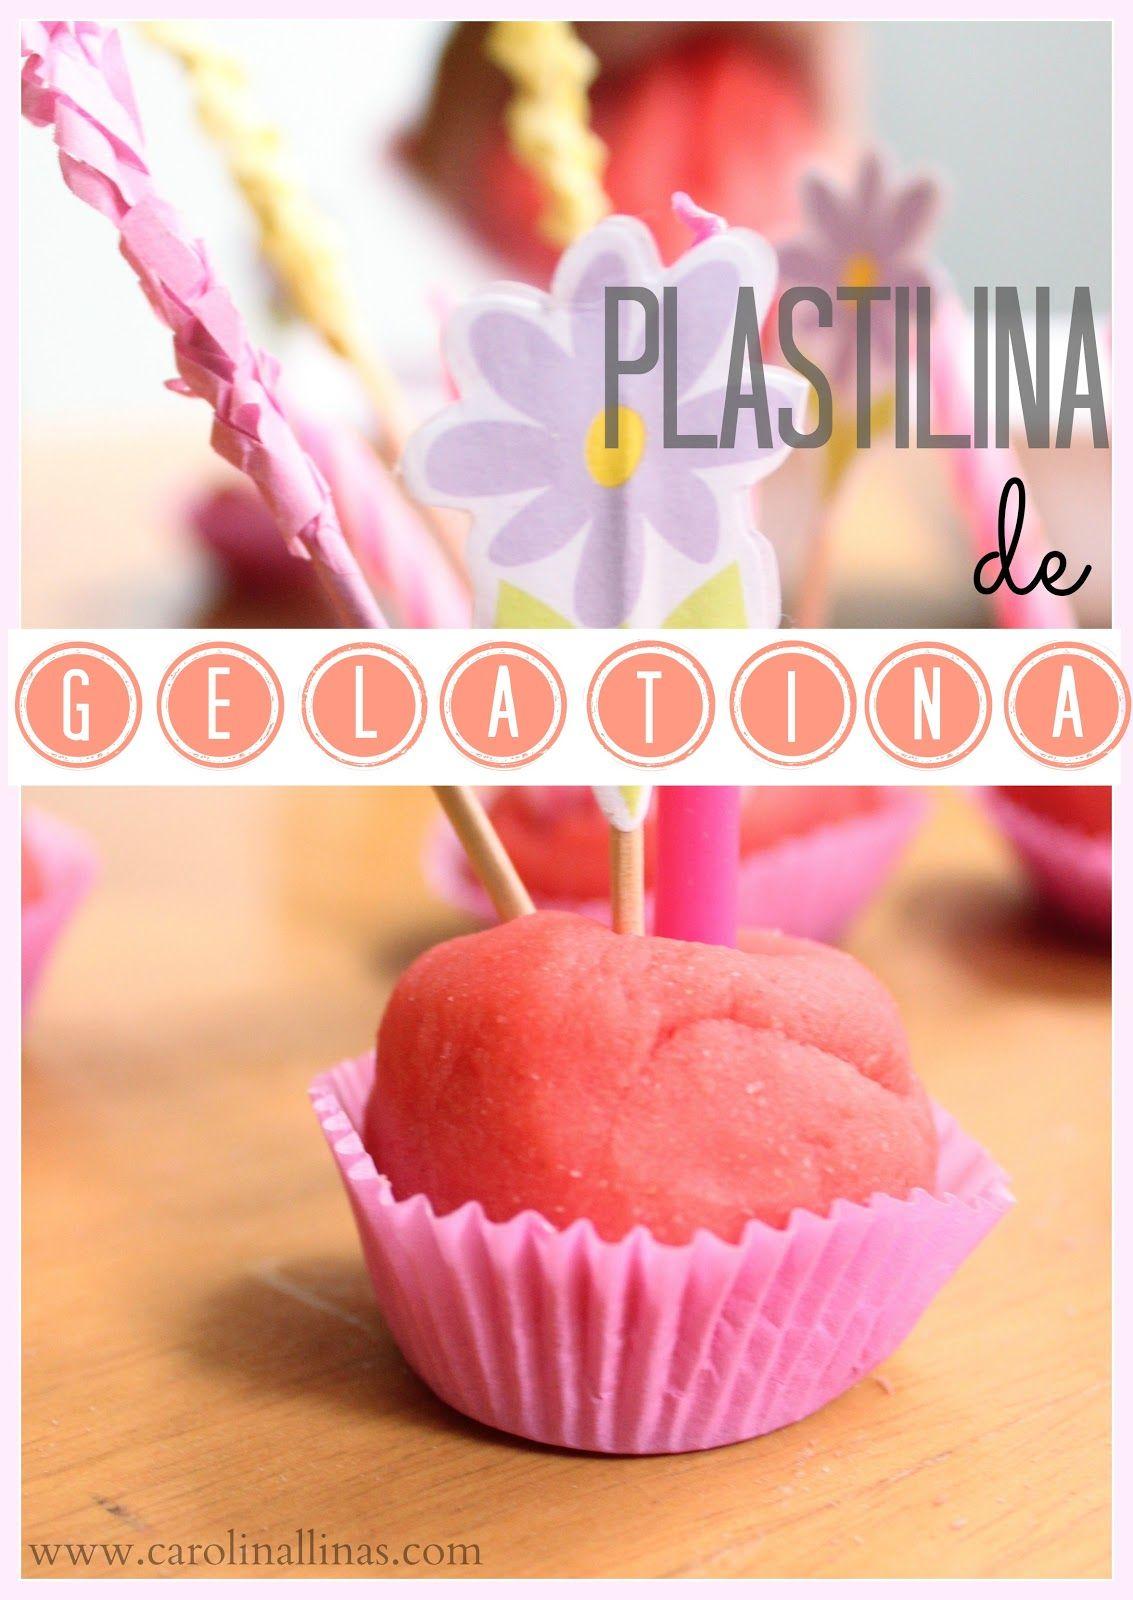 Receta para plastilina de gelatina